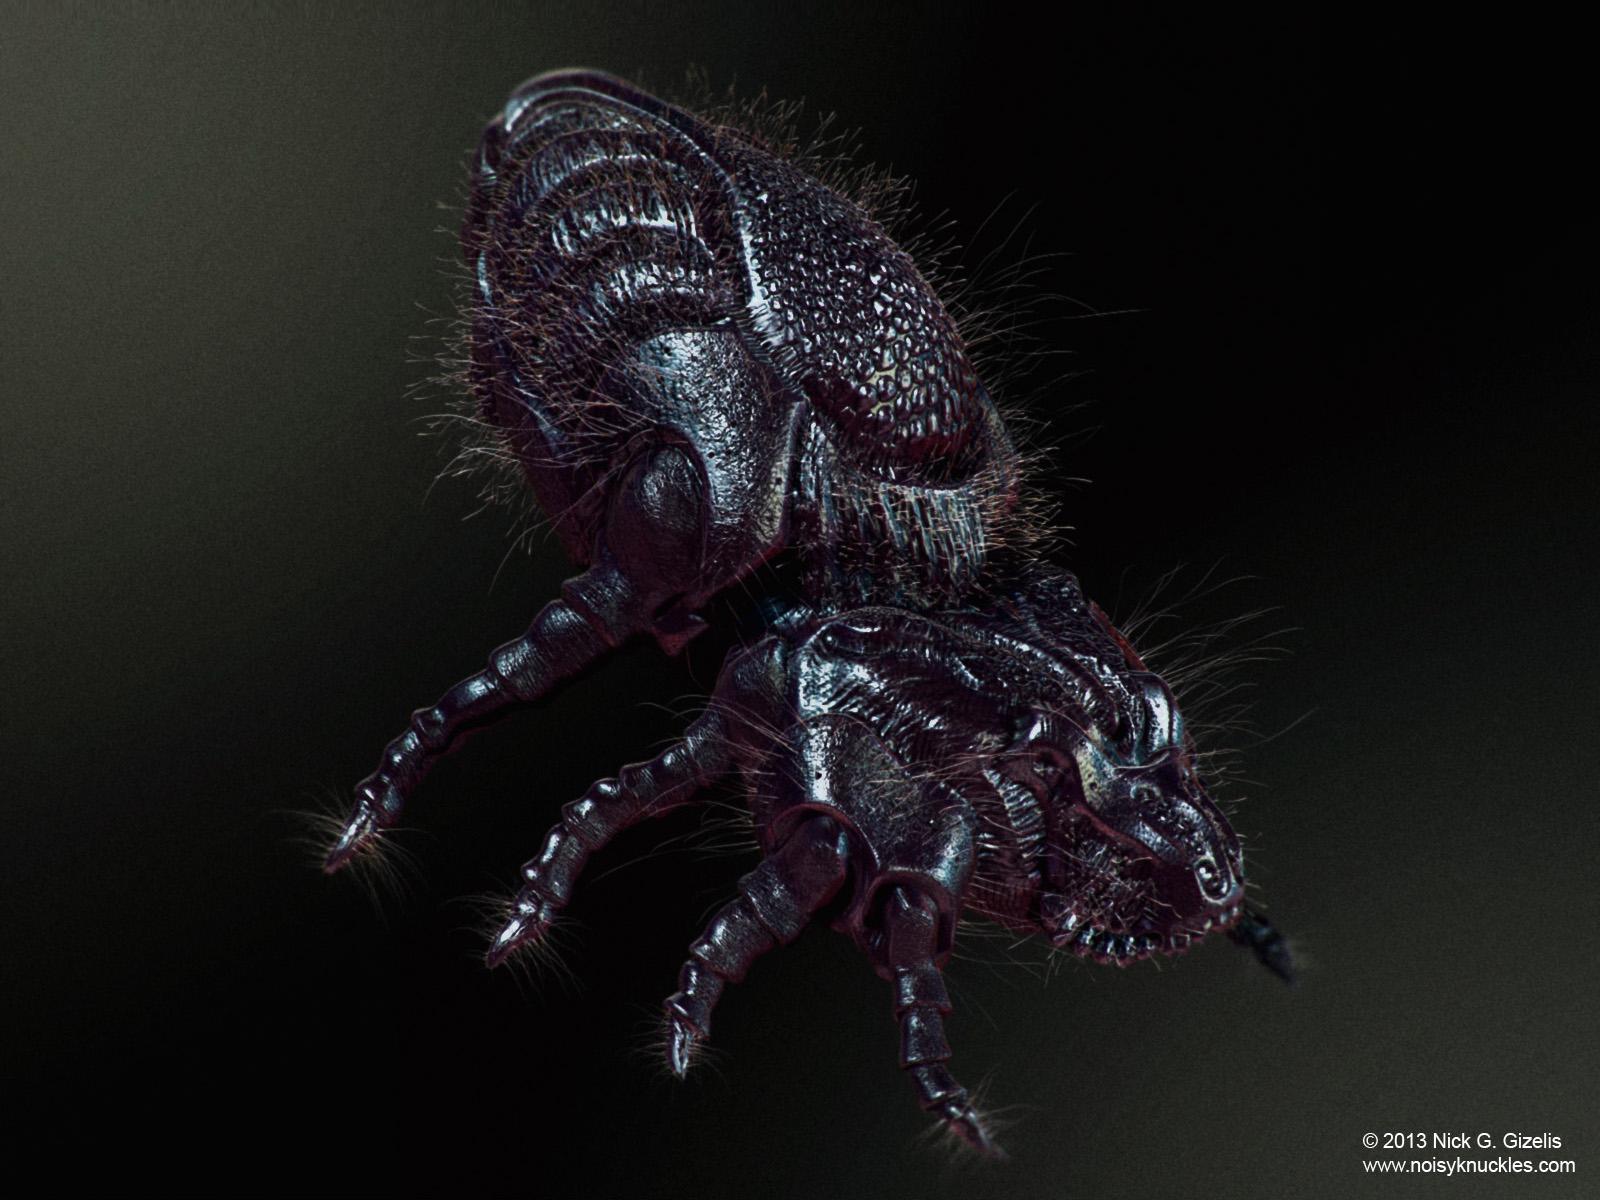 nick-gizelis-micro-dustmite-01